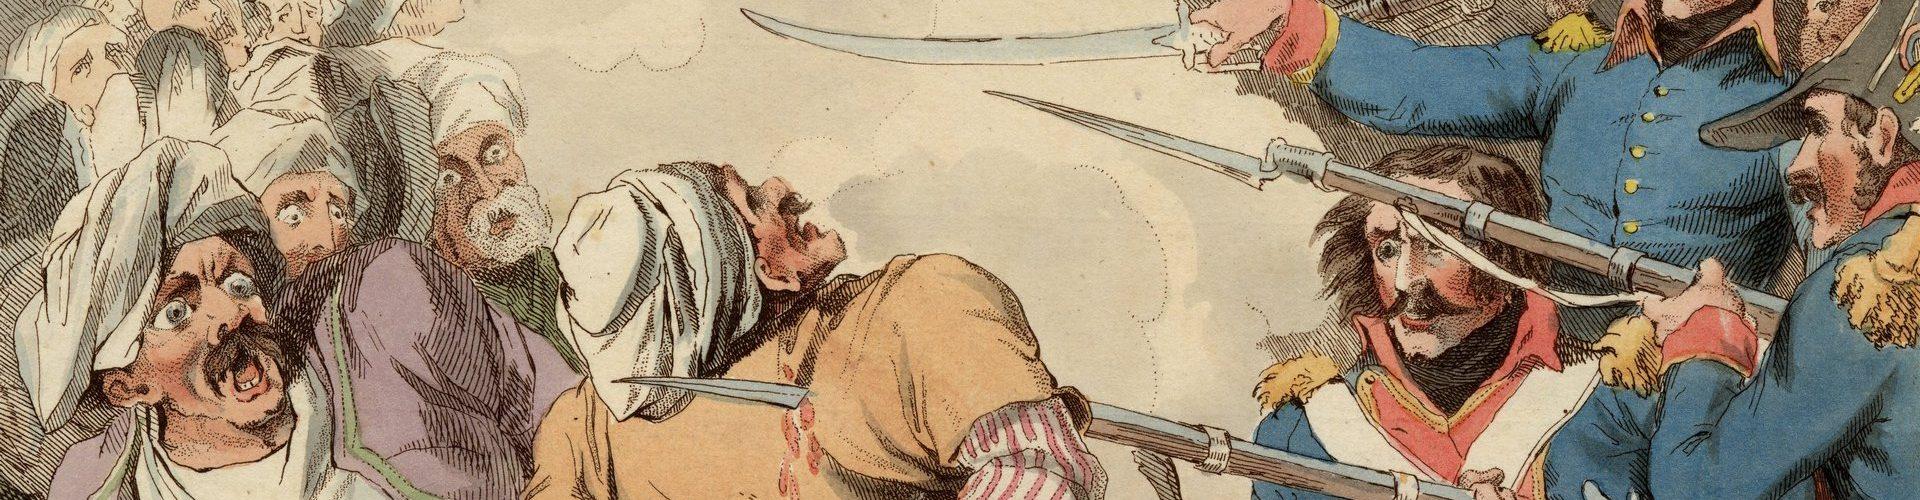 Masakra obrońców Jaffy (M.K. Porter/domena publiczna).